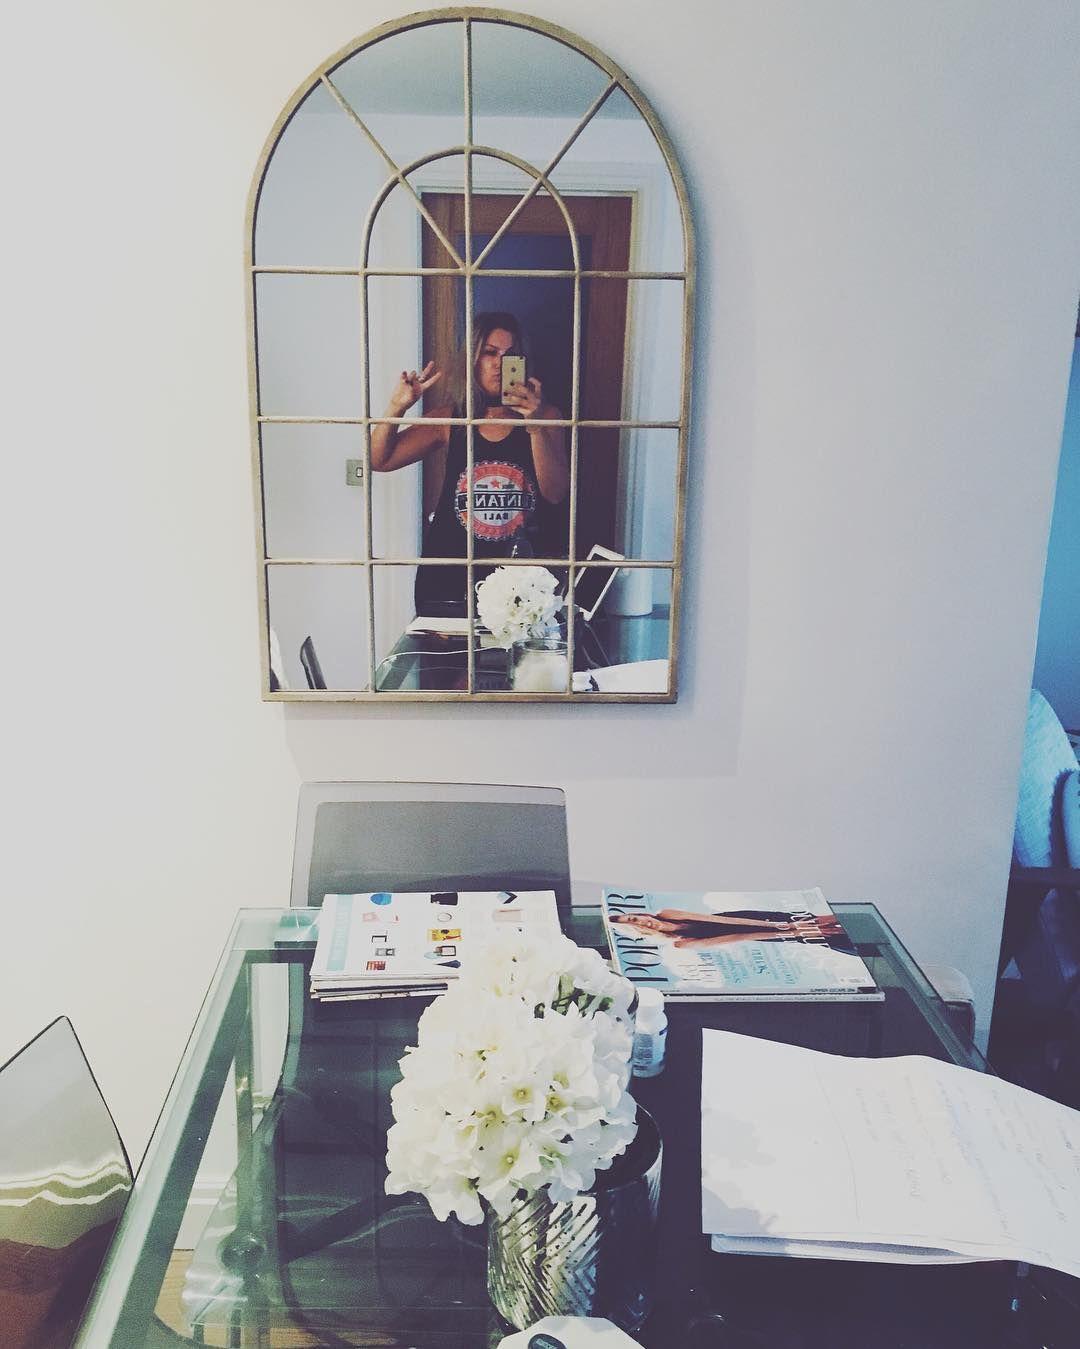 Laters Friday ✌🏼️ #laptopclosed  #owt #girlboss #homeoffice #friday #bankholidayweekend #sunshine #interiorblog #fblog #fblogger #fashionblogger #fashionblog #interiordesign #entrepreneur #homeblog #interiors #messydesk #stylist #bankholiday #bankhol